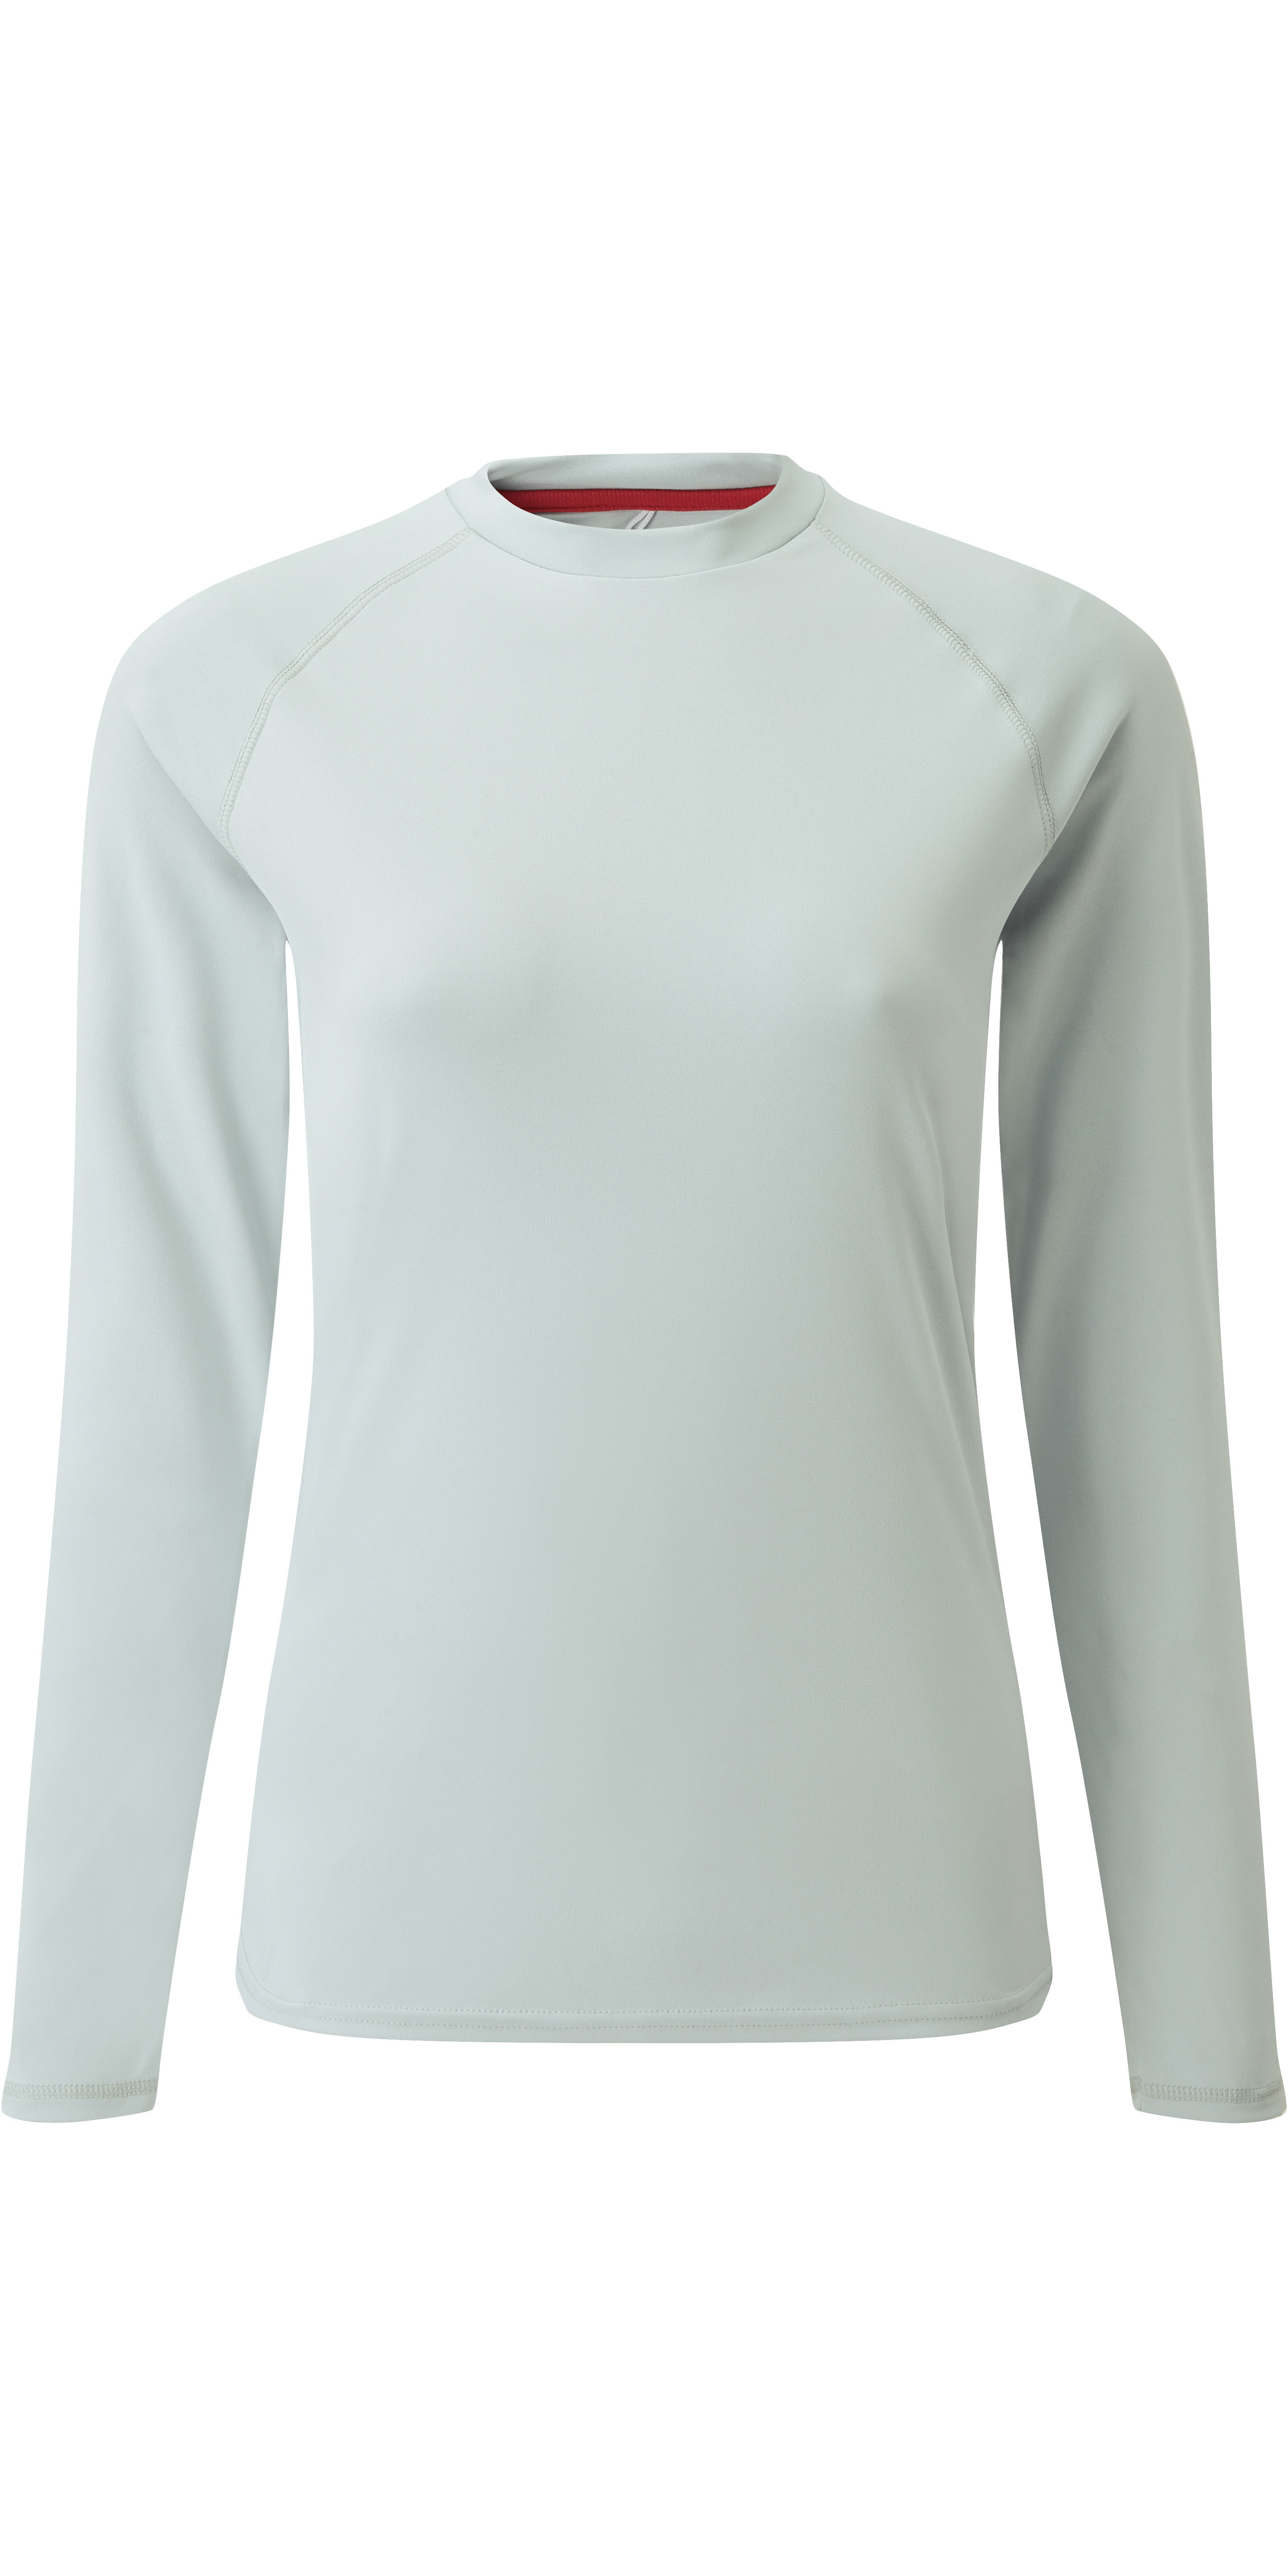 2019 Gill Womens Long Sleeve UV Tec Tee Grey UV011W